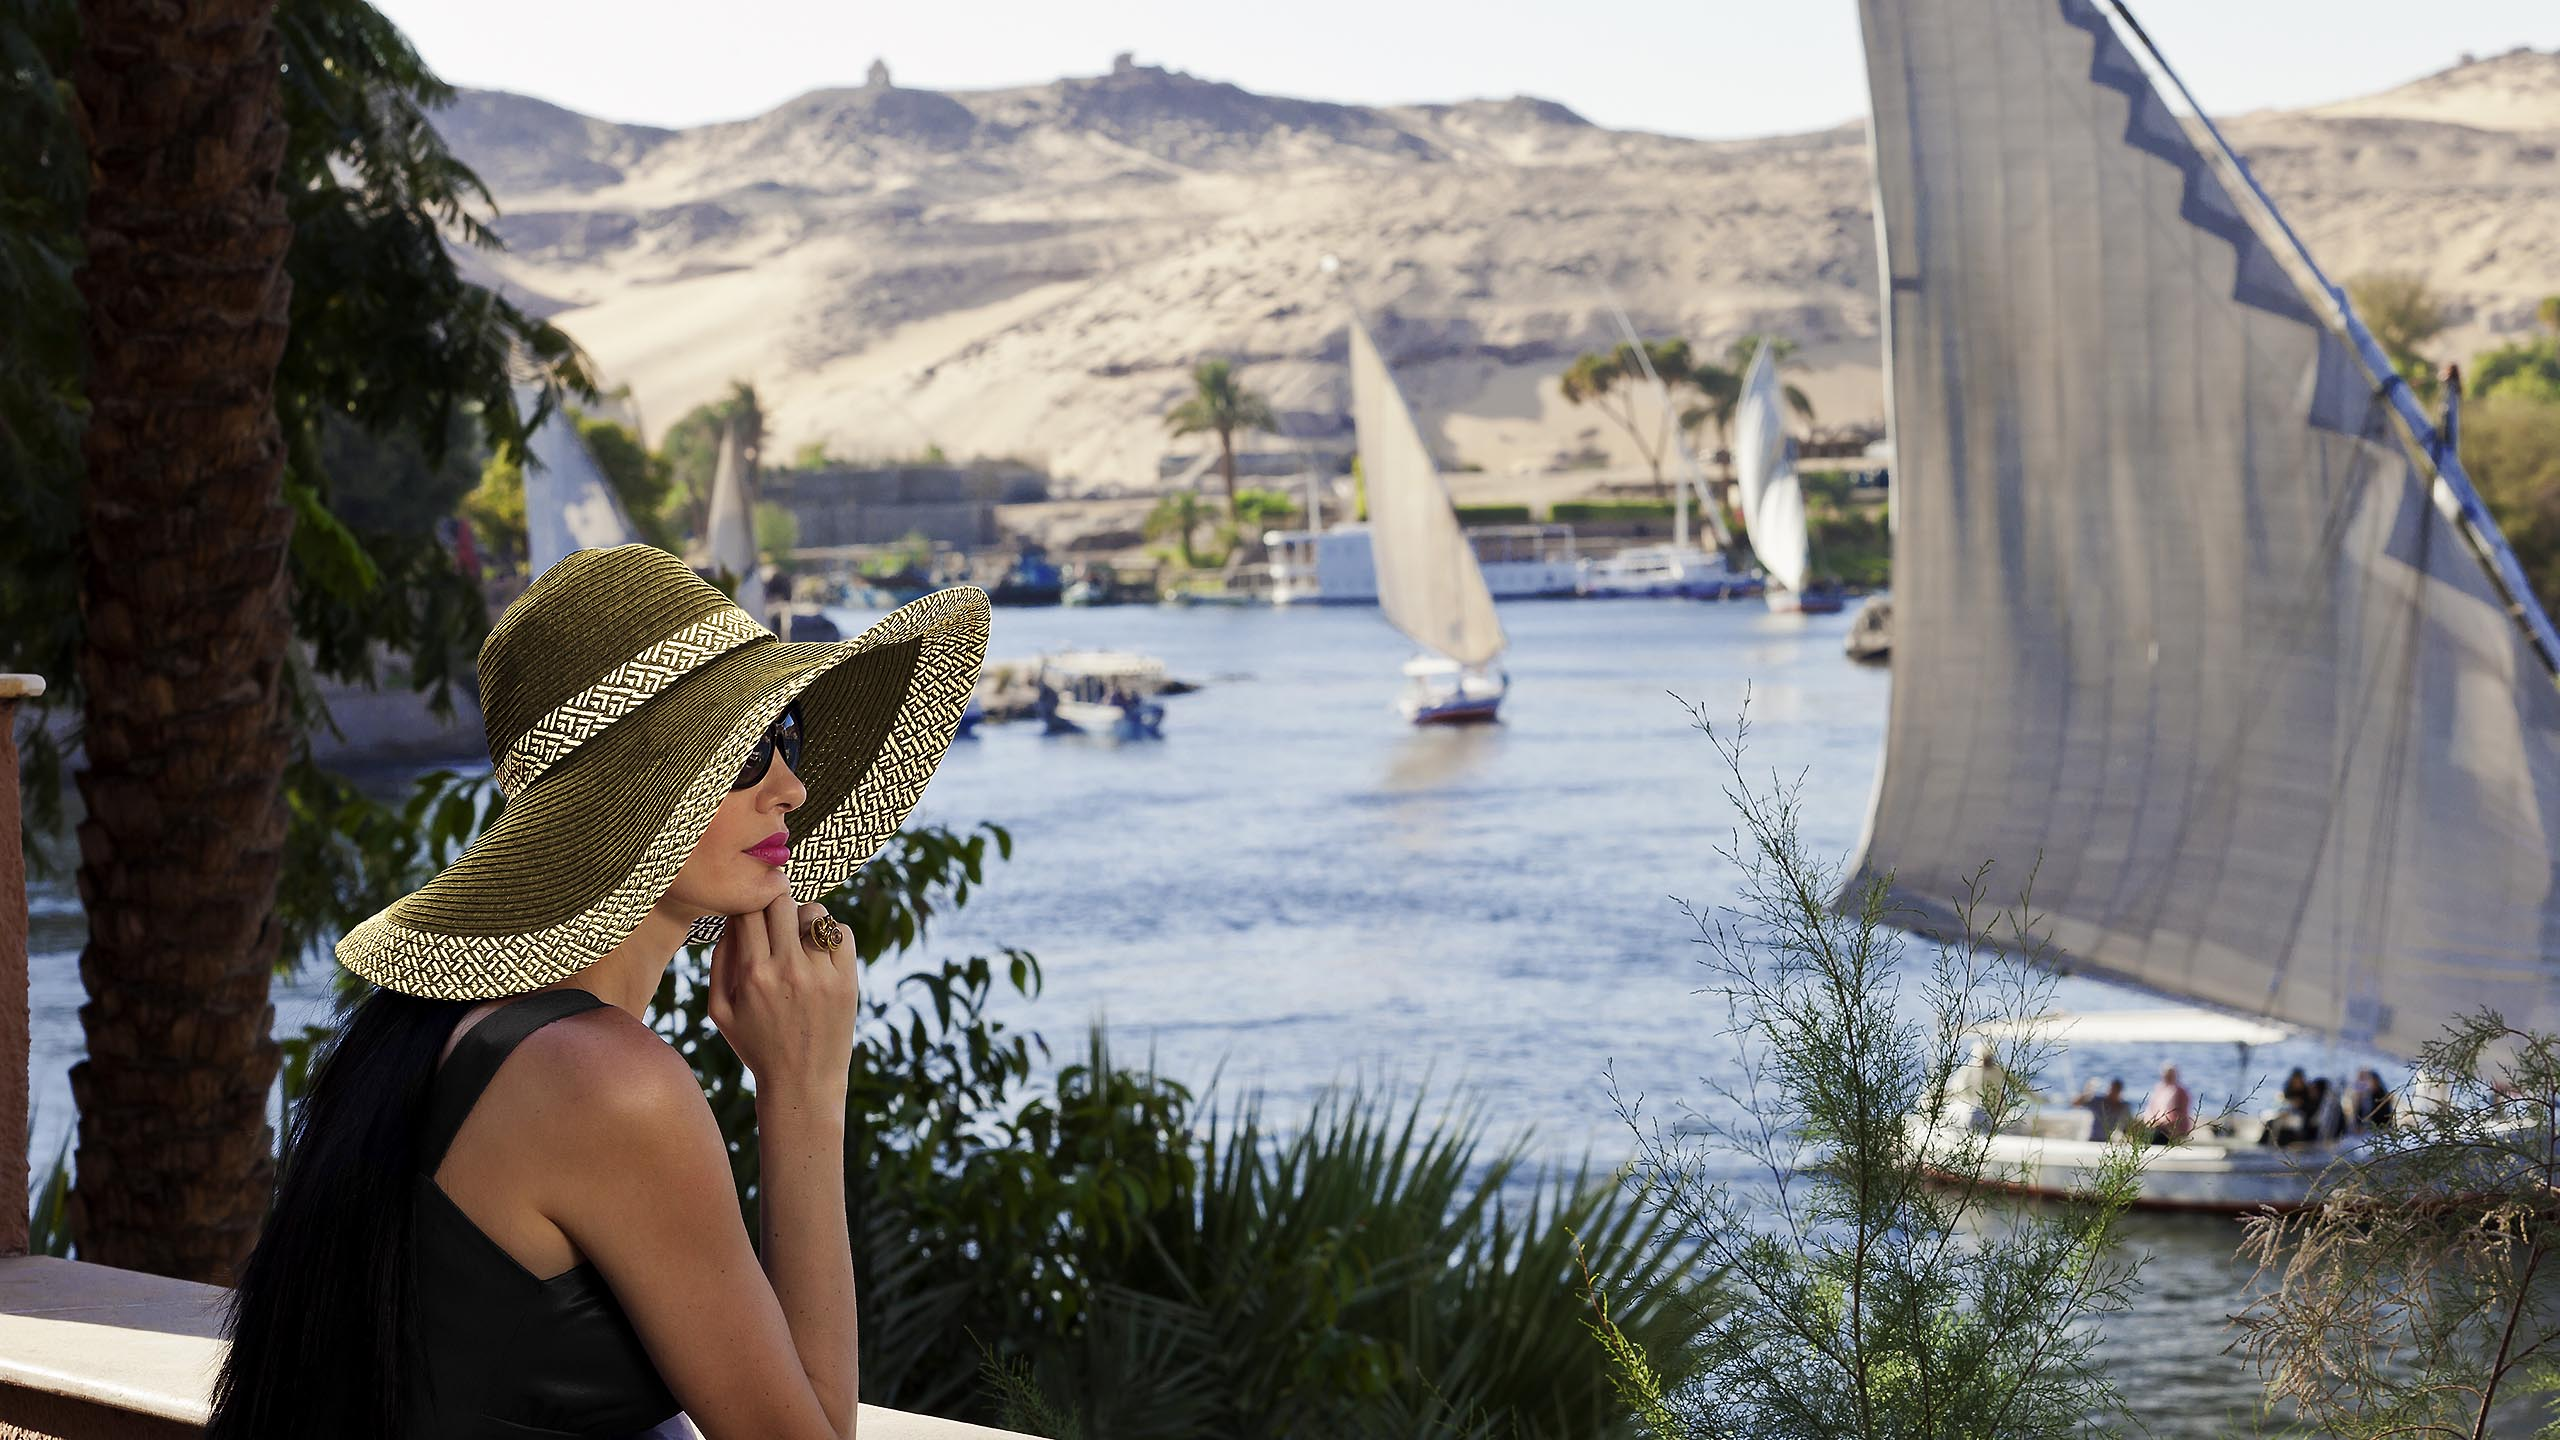 Cairo and Nile Cruise holidays, Aswan, Egypt luxury tours, Luxury egypt tours, deluxe tours egypt